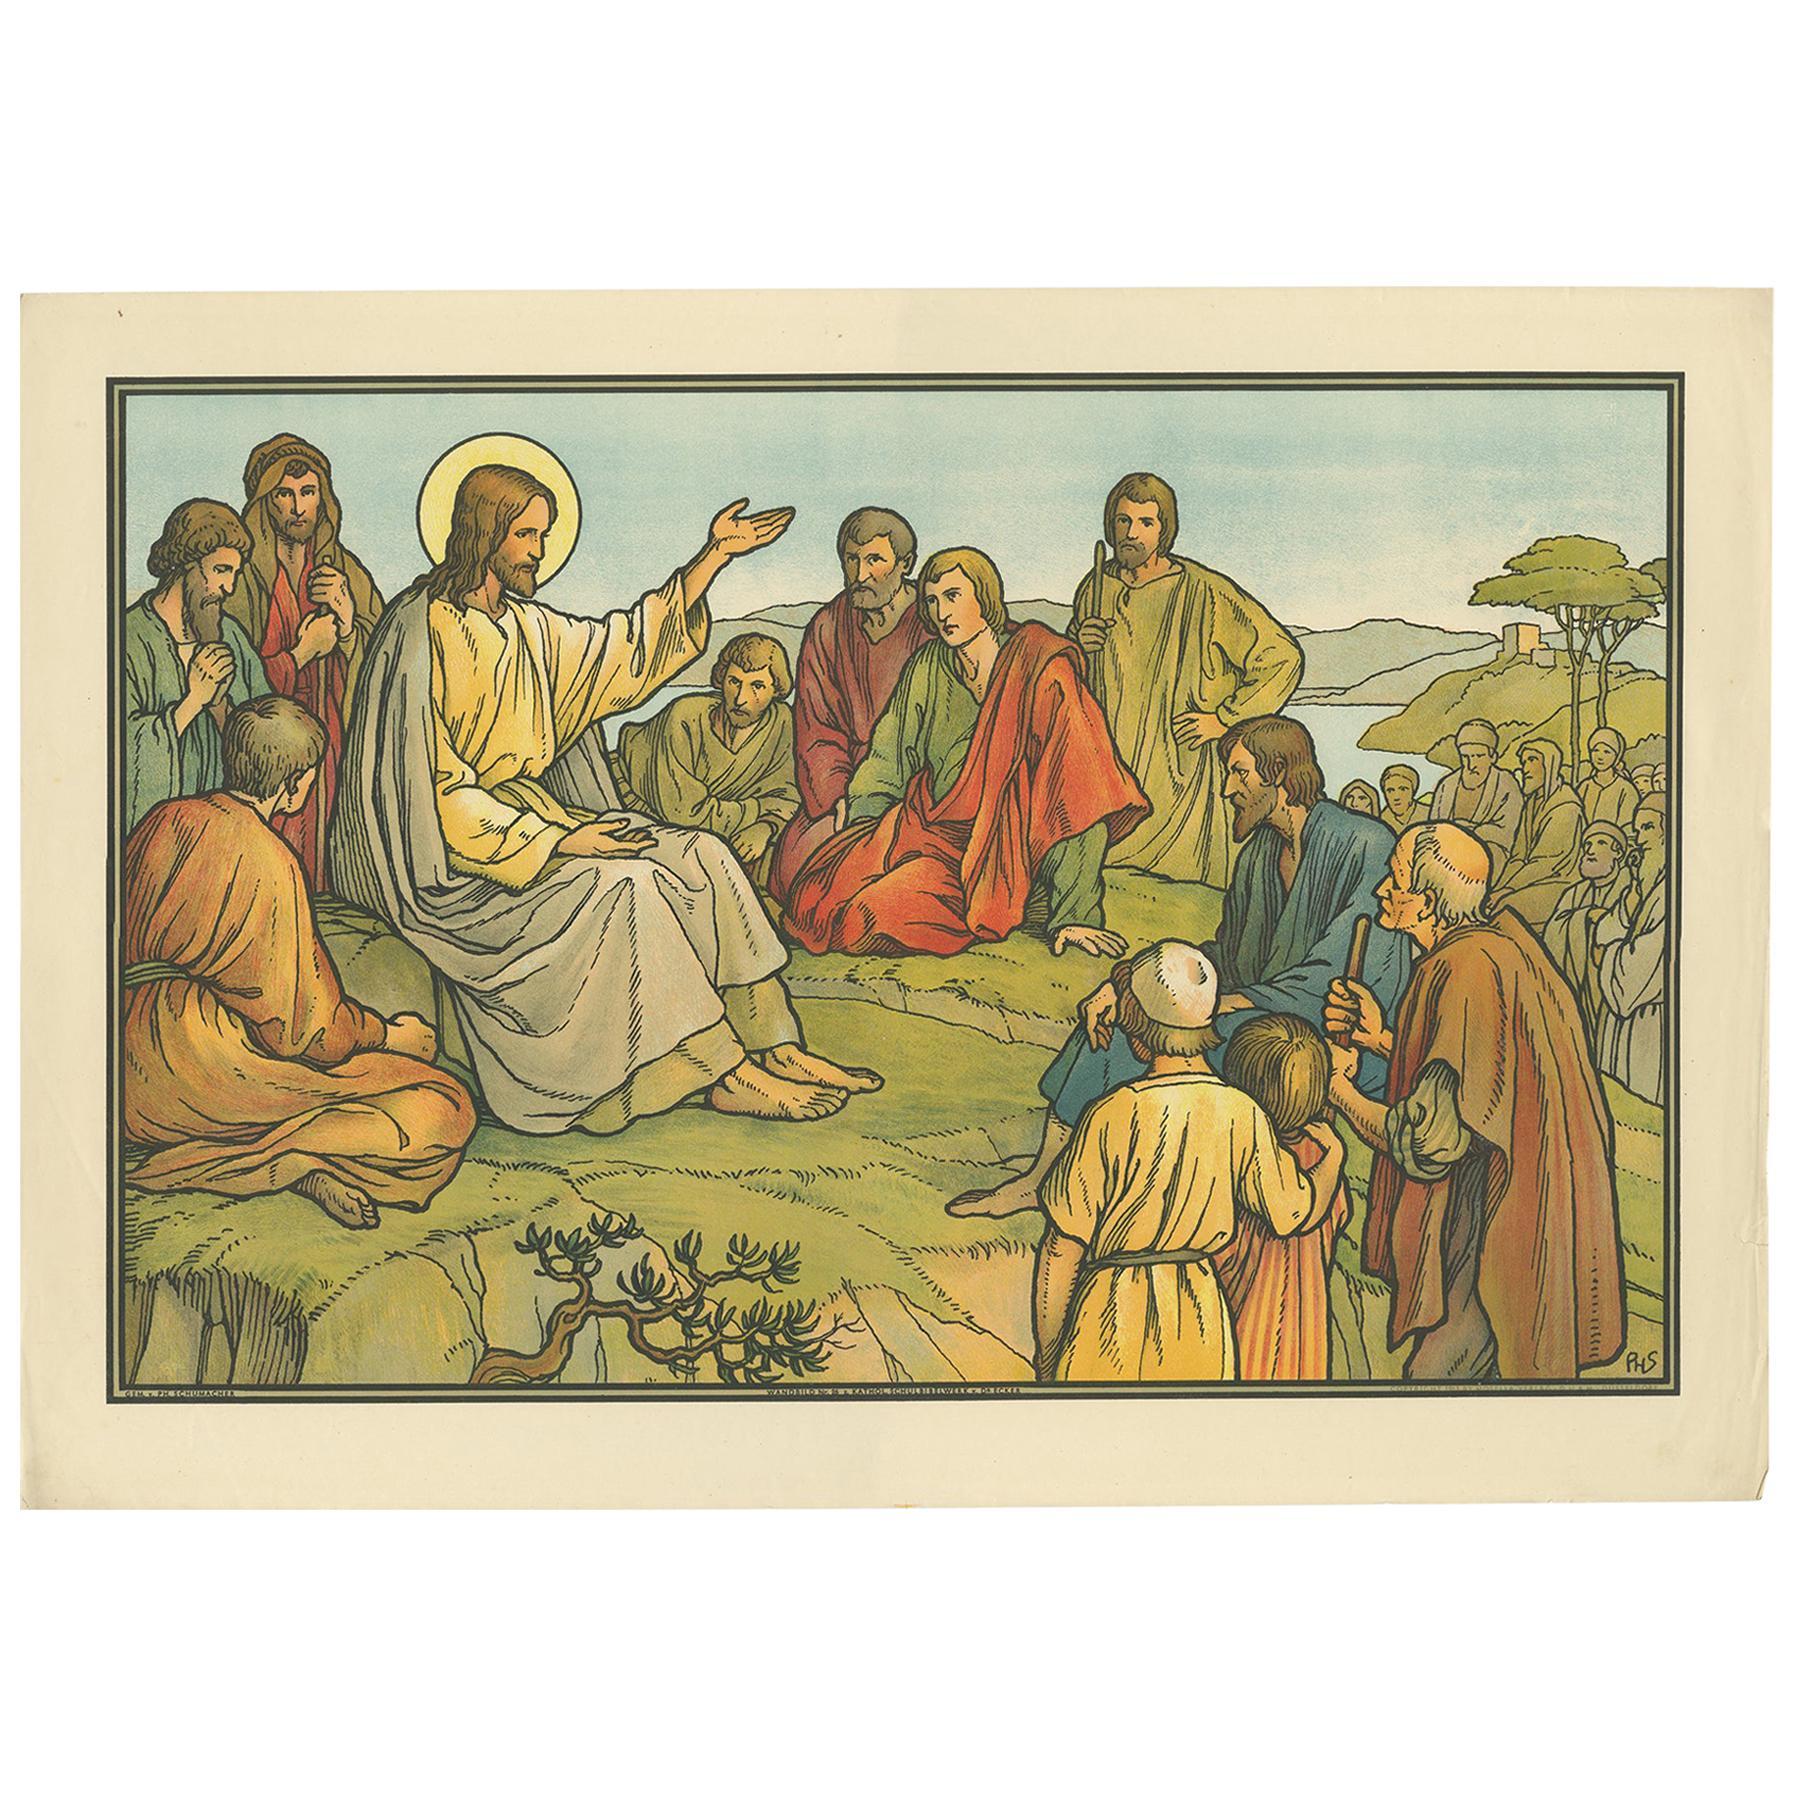 Antique Religion Print of the Sermon on the Mount, 1913